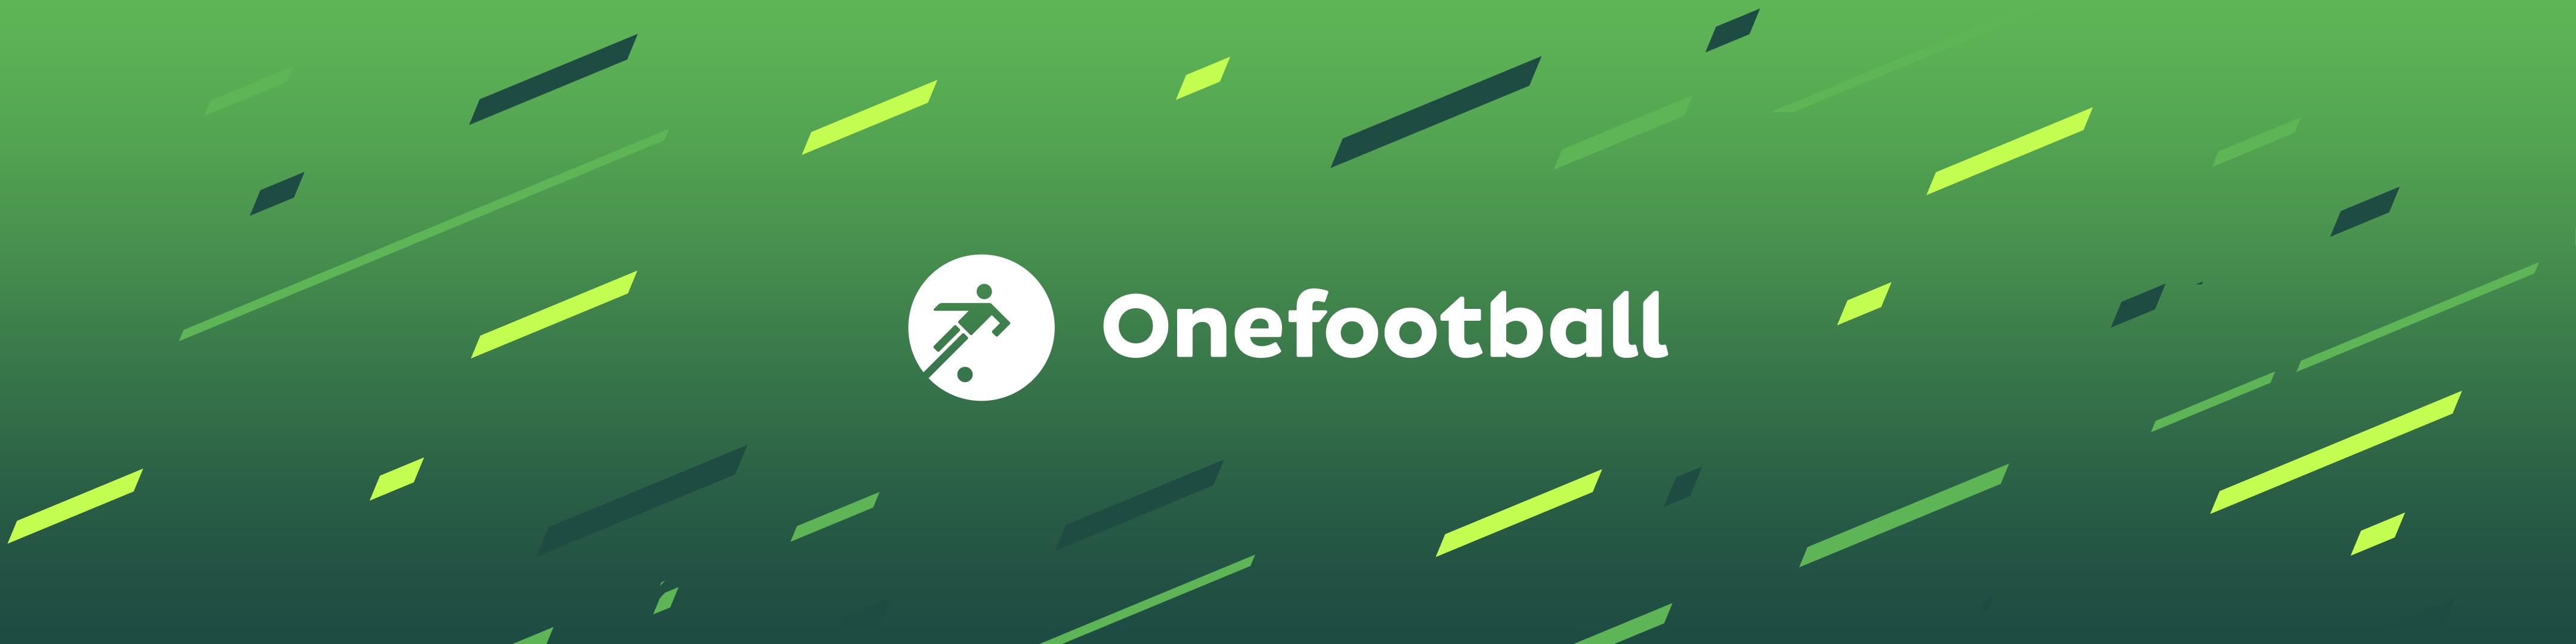 Onefootball Fussball News Revenue Download Estimates